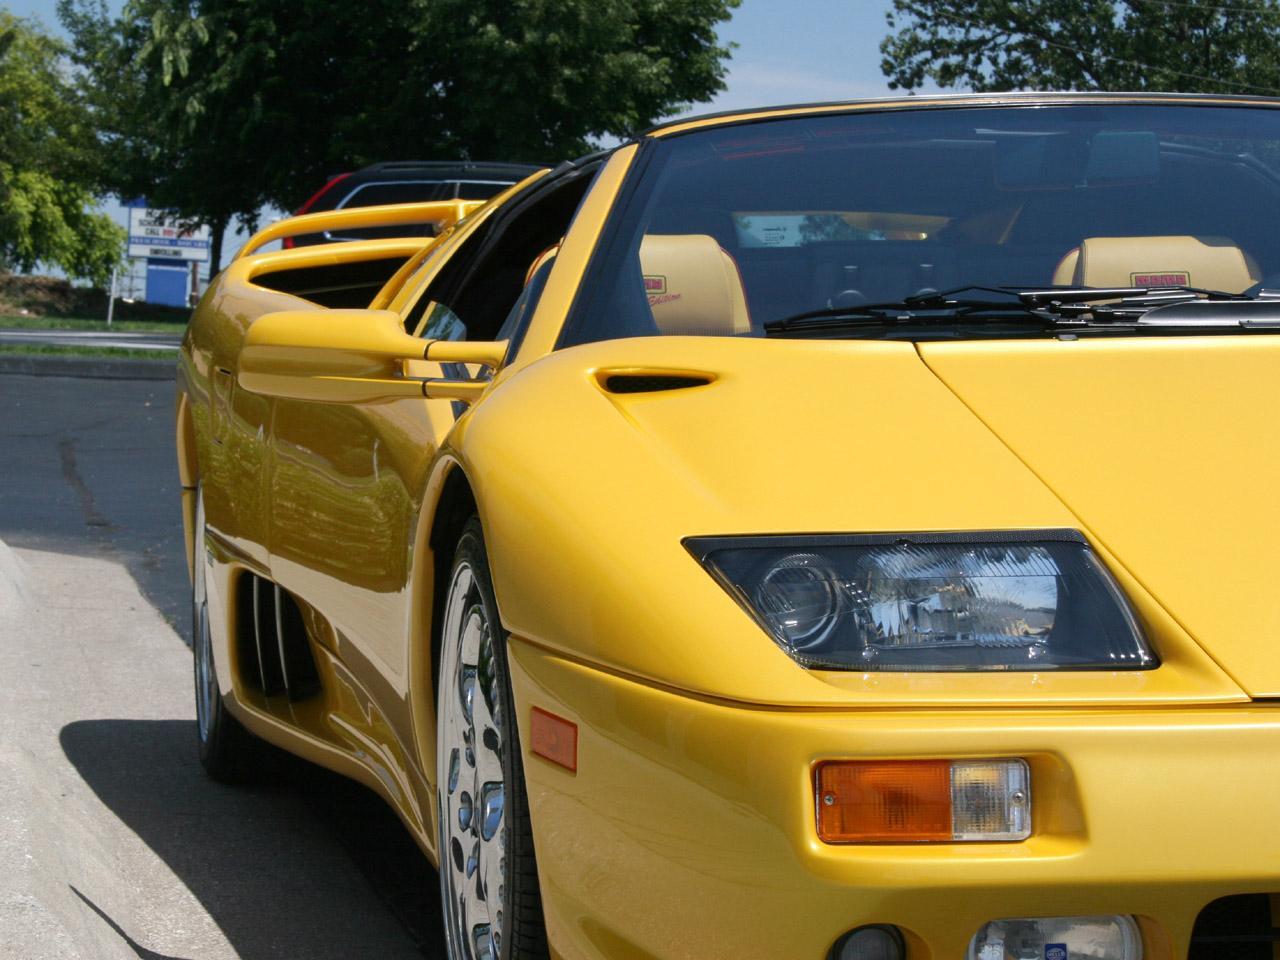 Lamborghini Diablo Vt Roadster Technical Details History